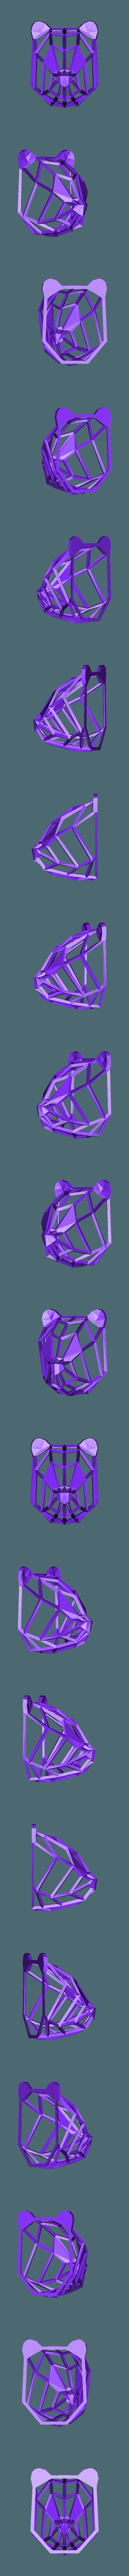 wireframe_panda.stl Download free STL file Wire Frame Panda Head • 3D printable design, caitlin_le